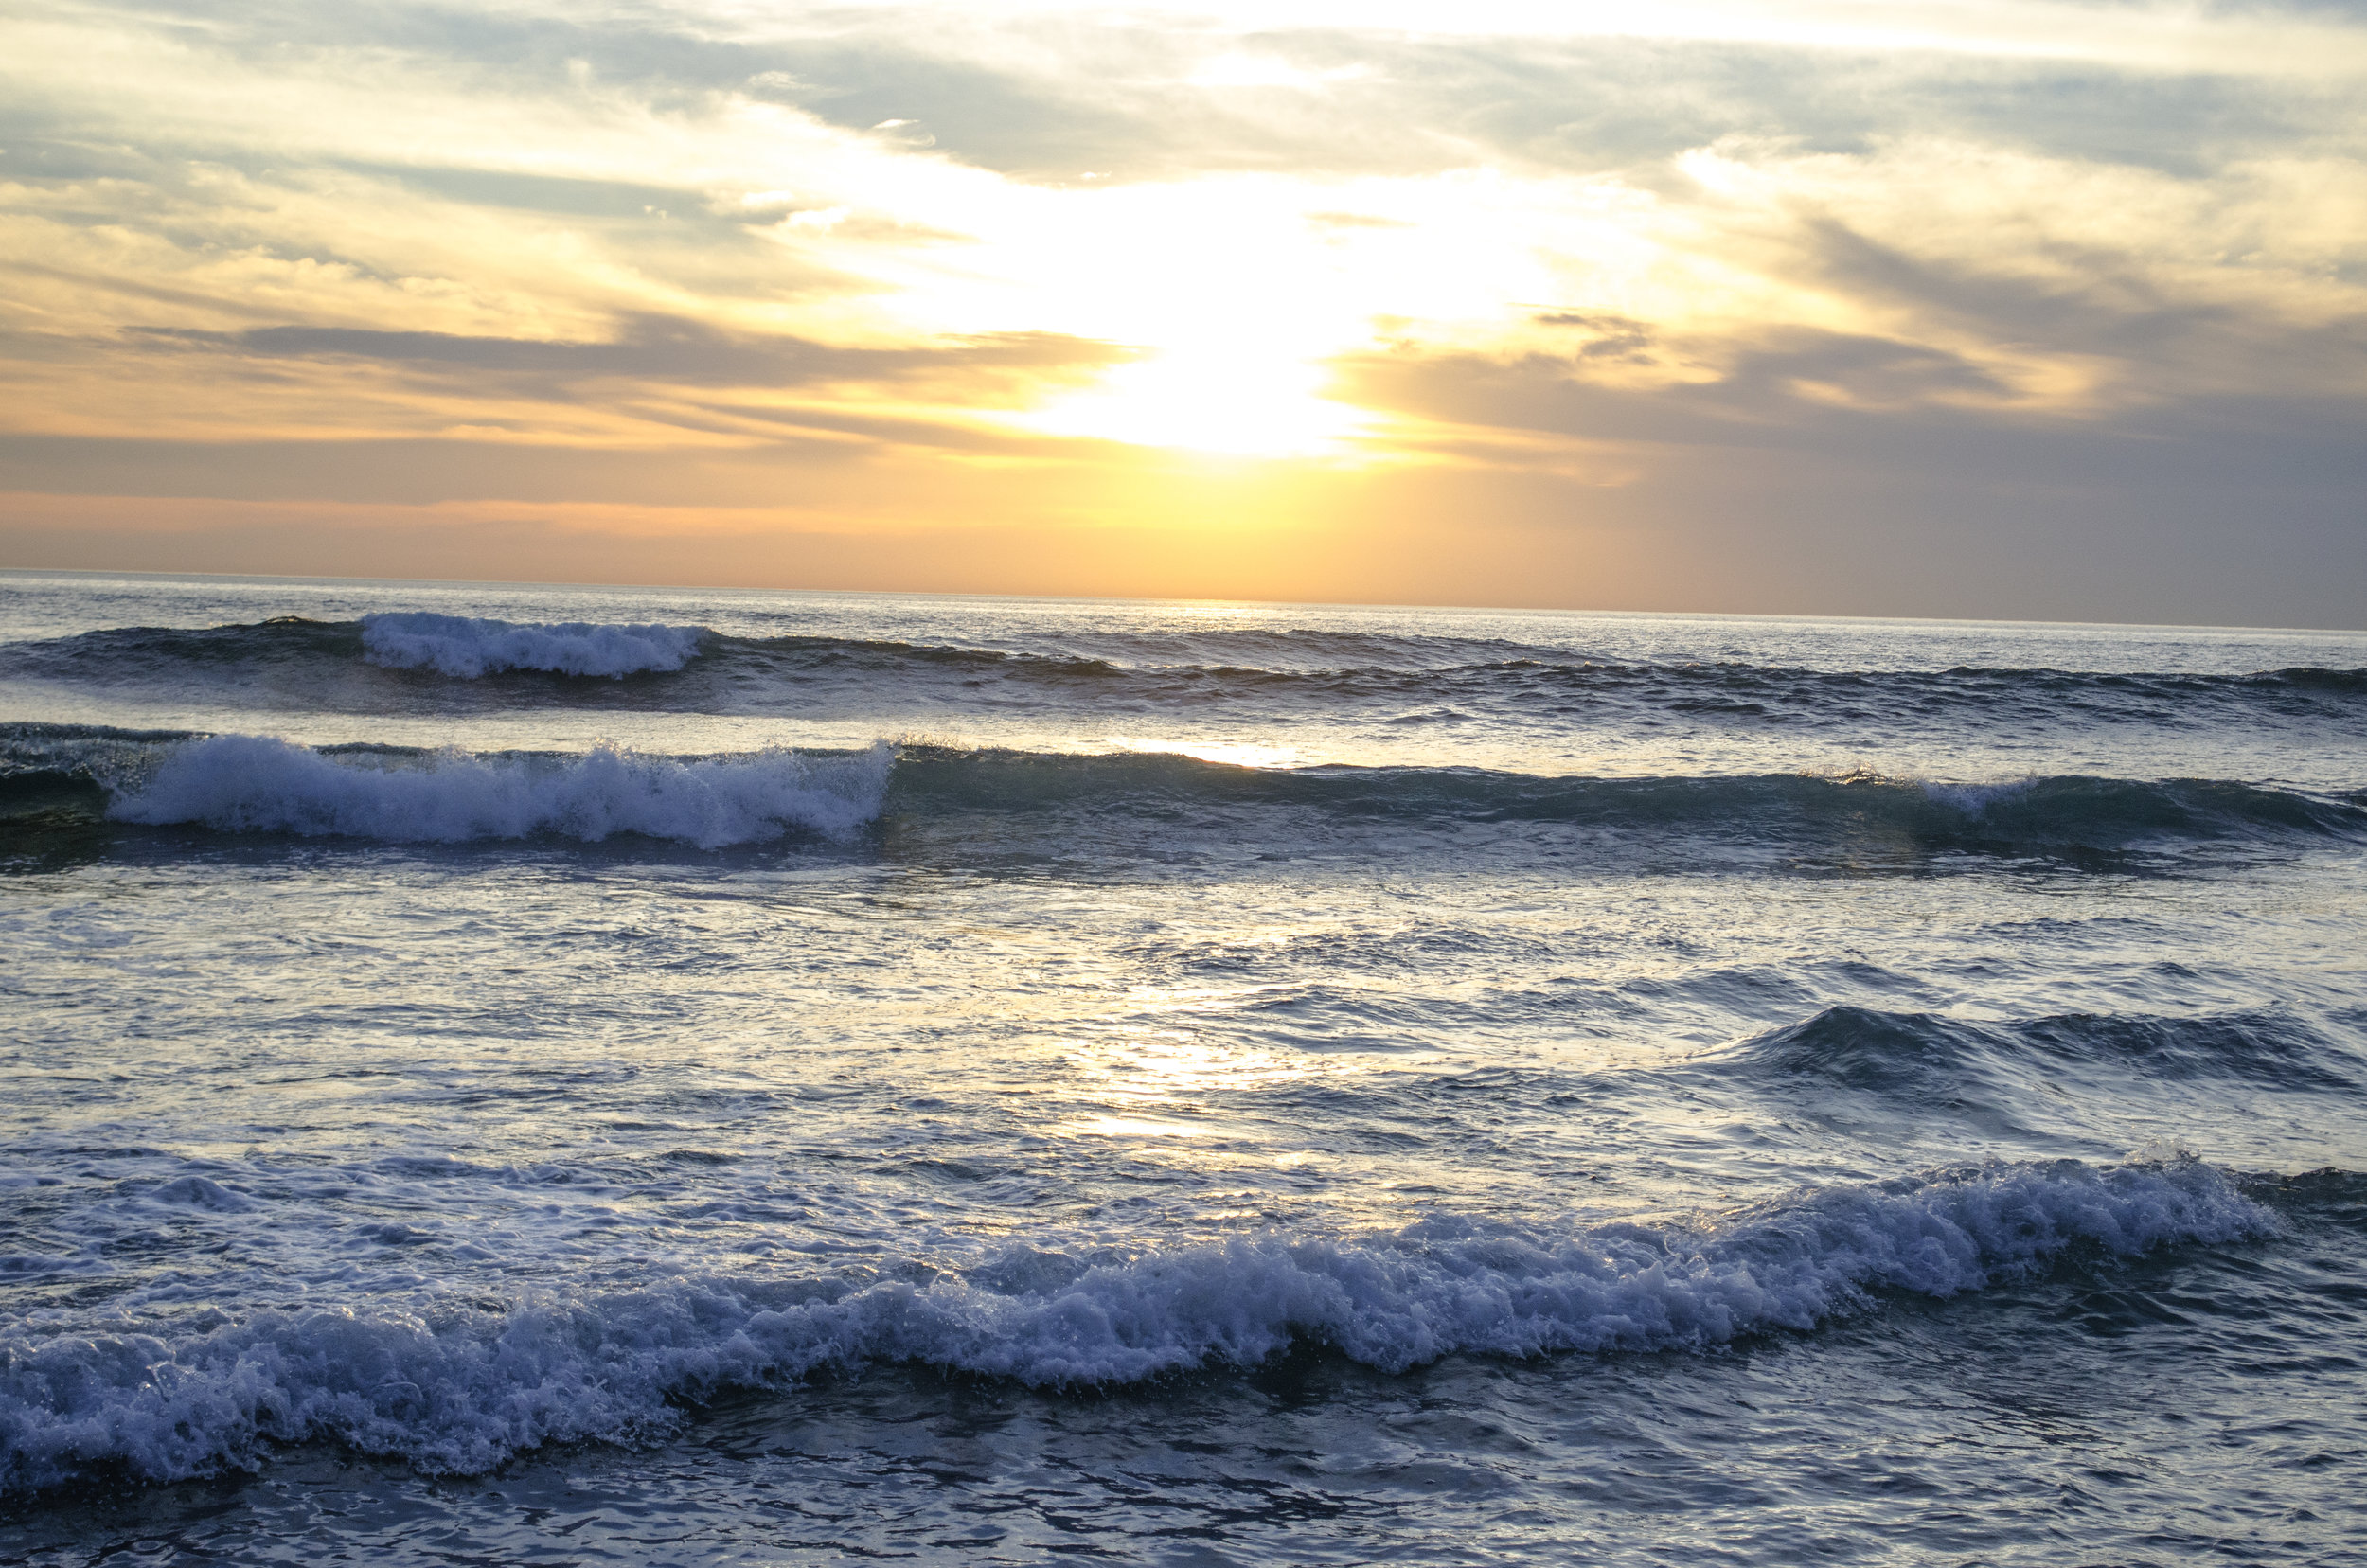 west-coast-sunset_16234084003_o.jpg